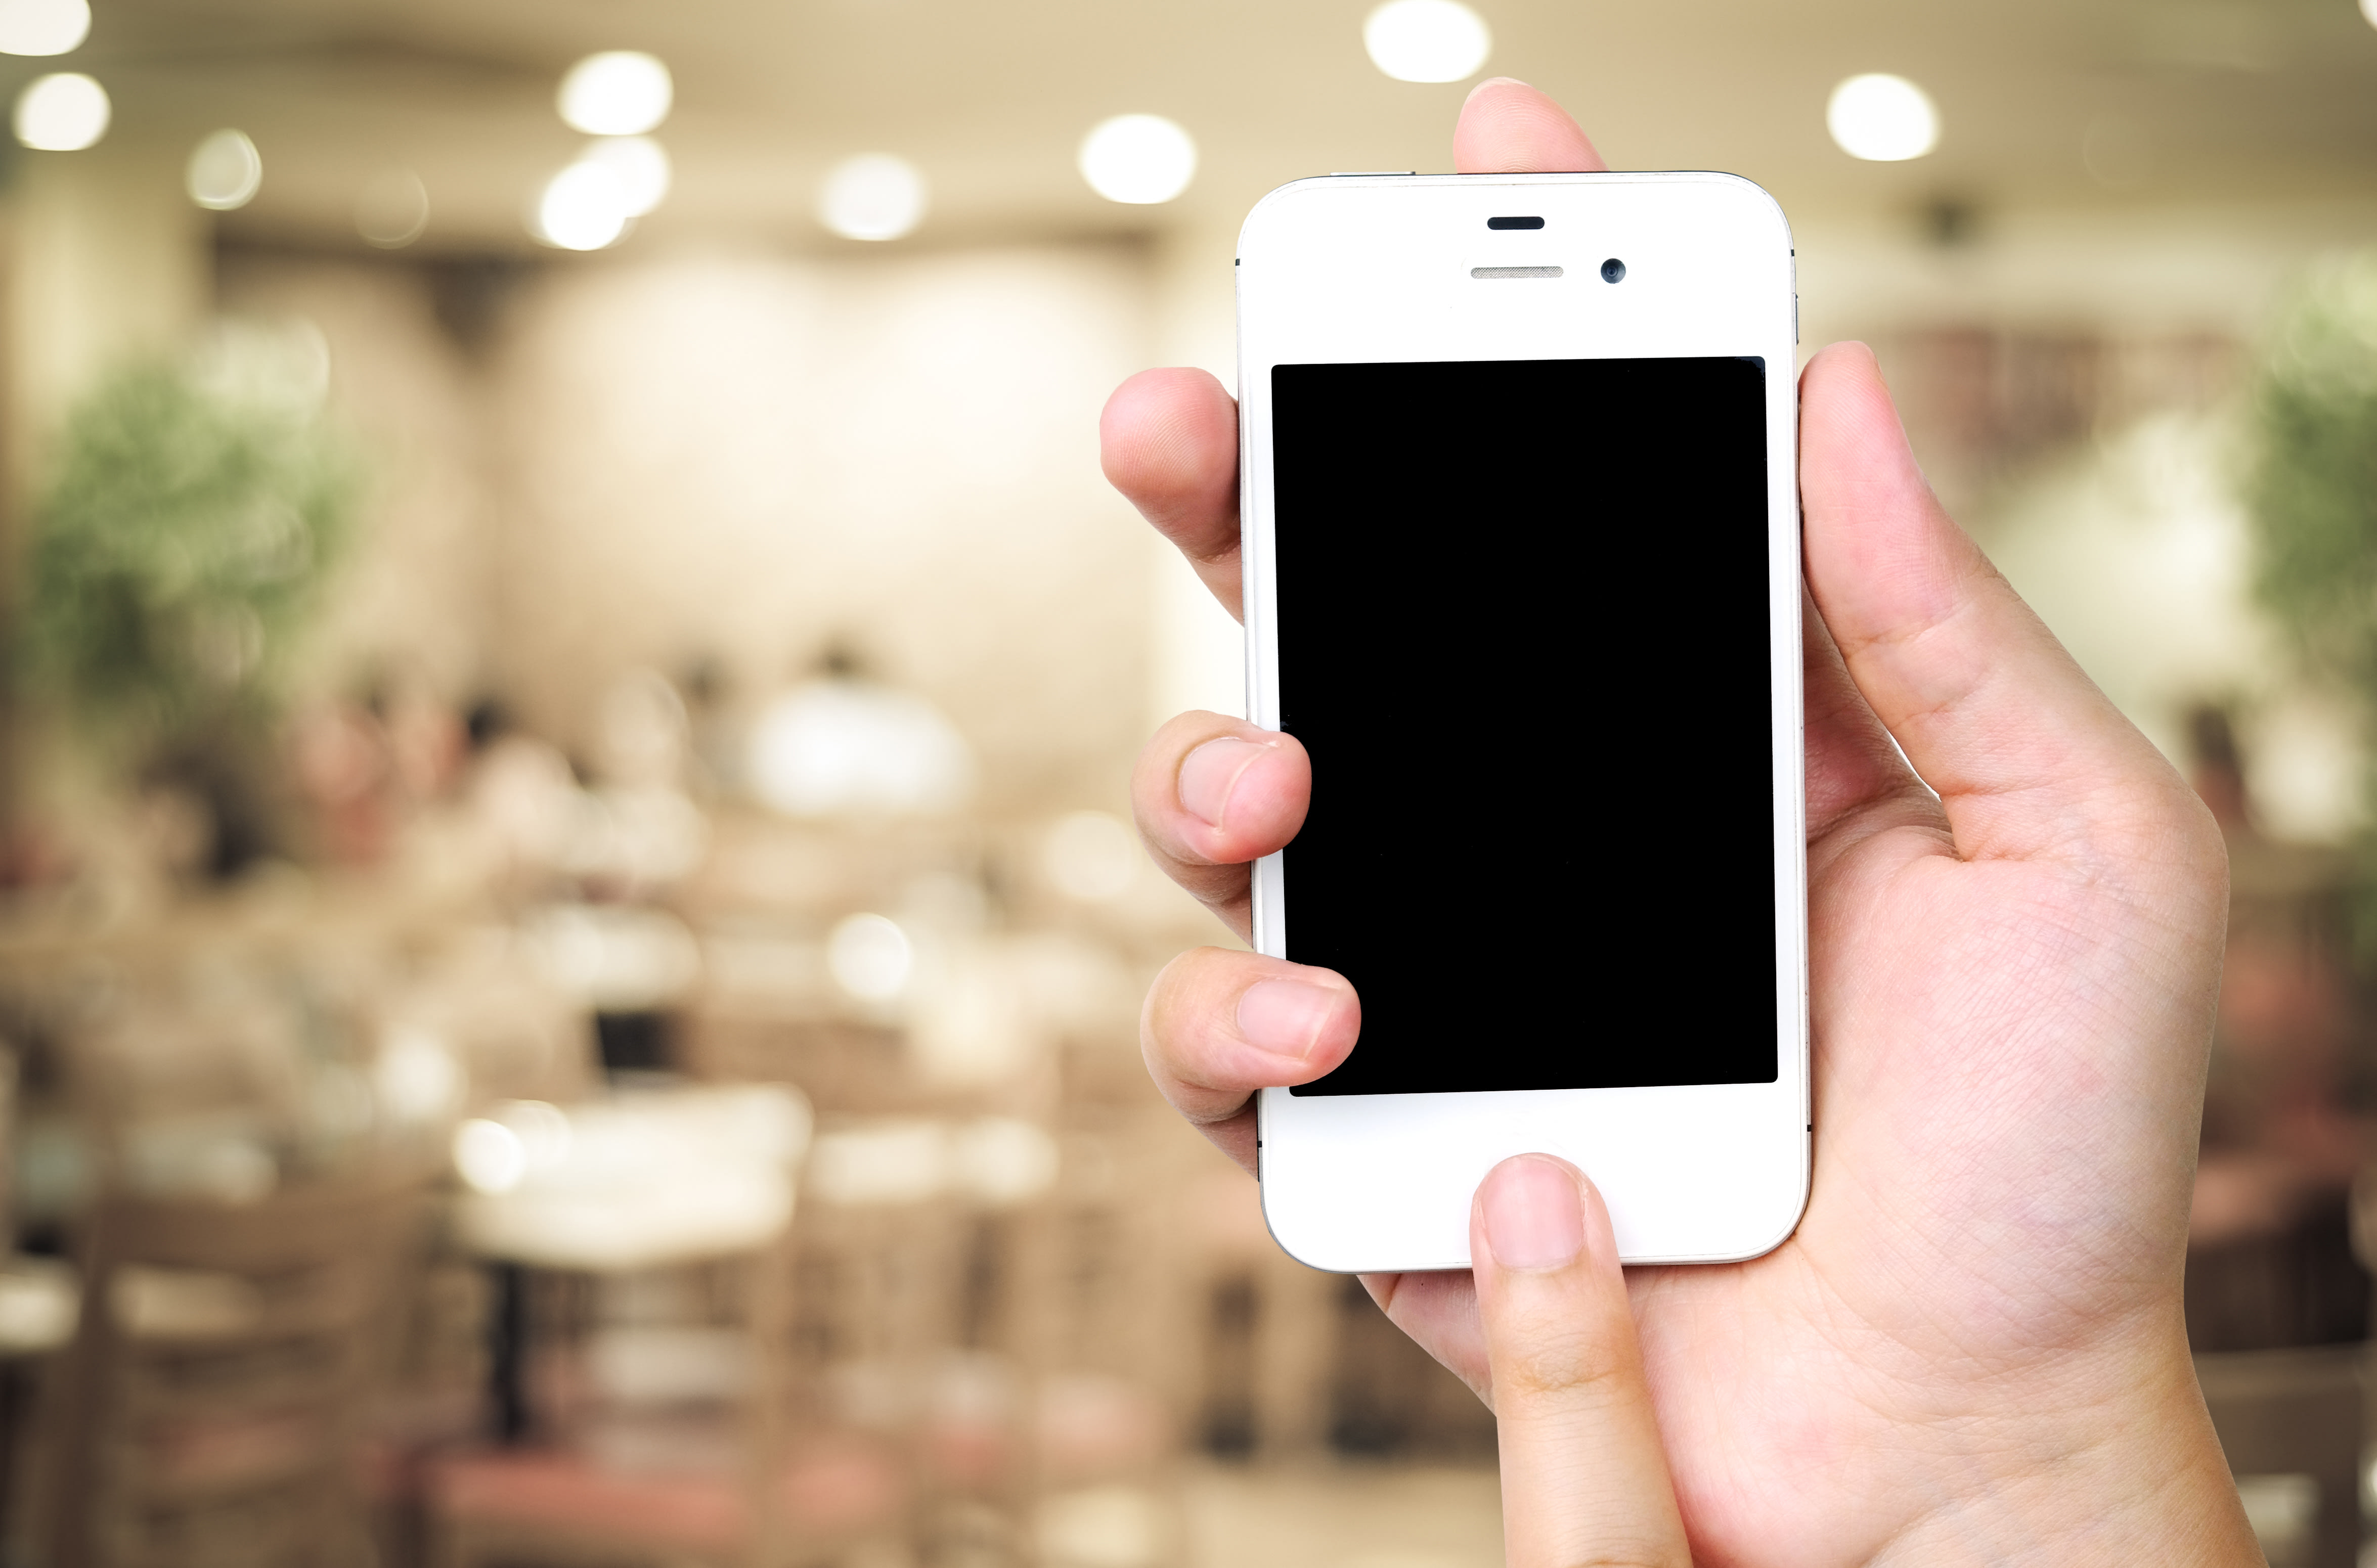 phone, hand, restaurant, alcohol inventory software